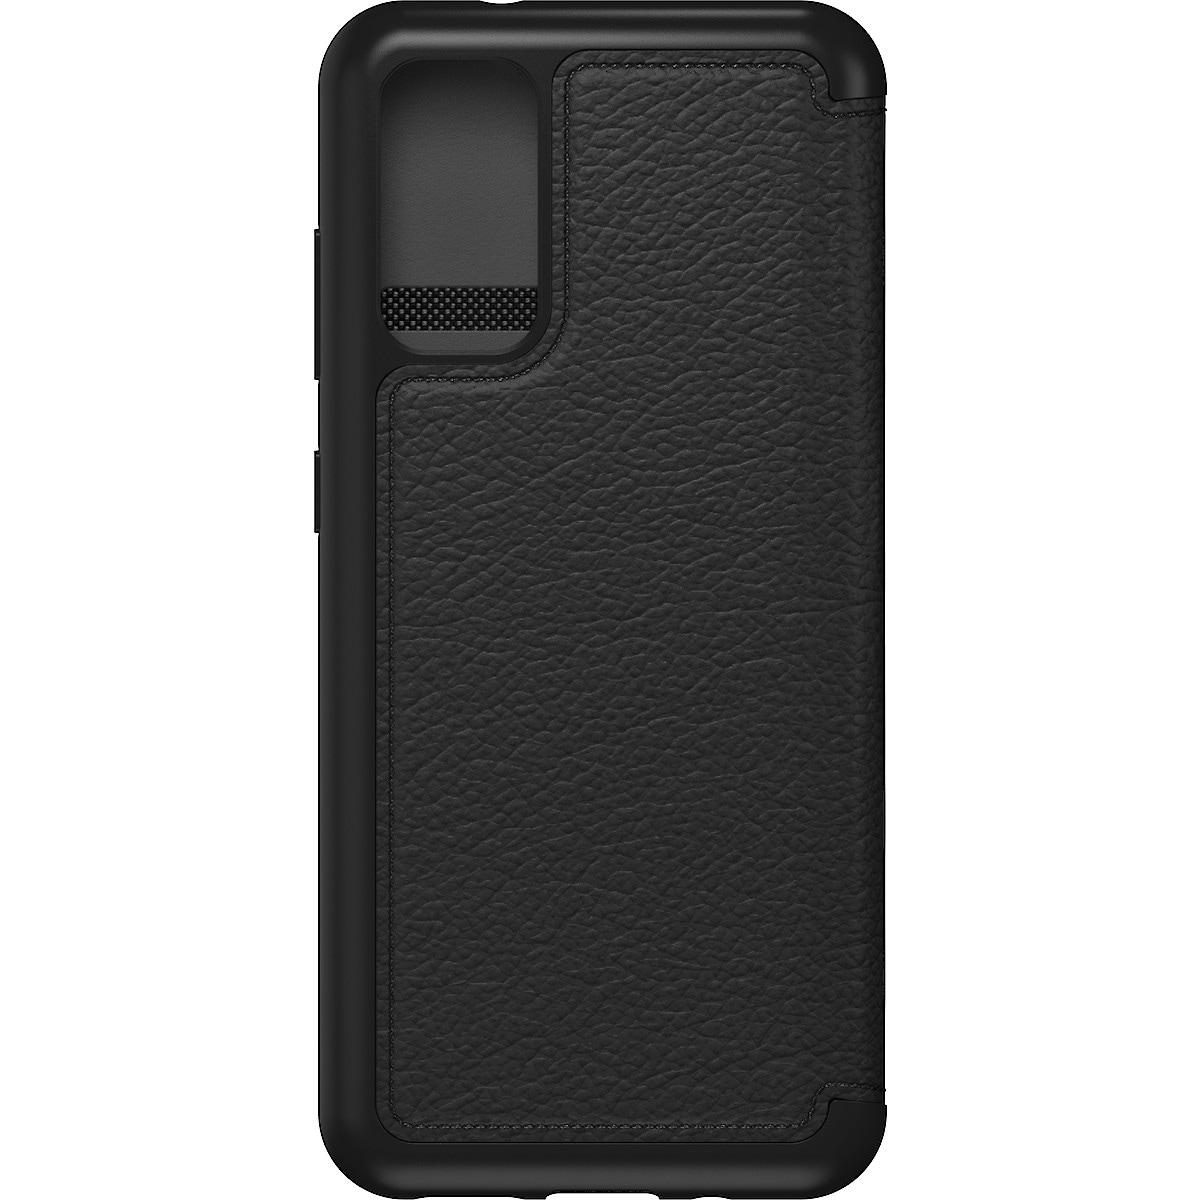 Otterbox Strada Folio deksel til Samsung Galaxy S20